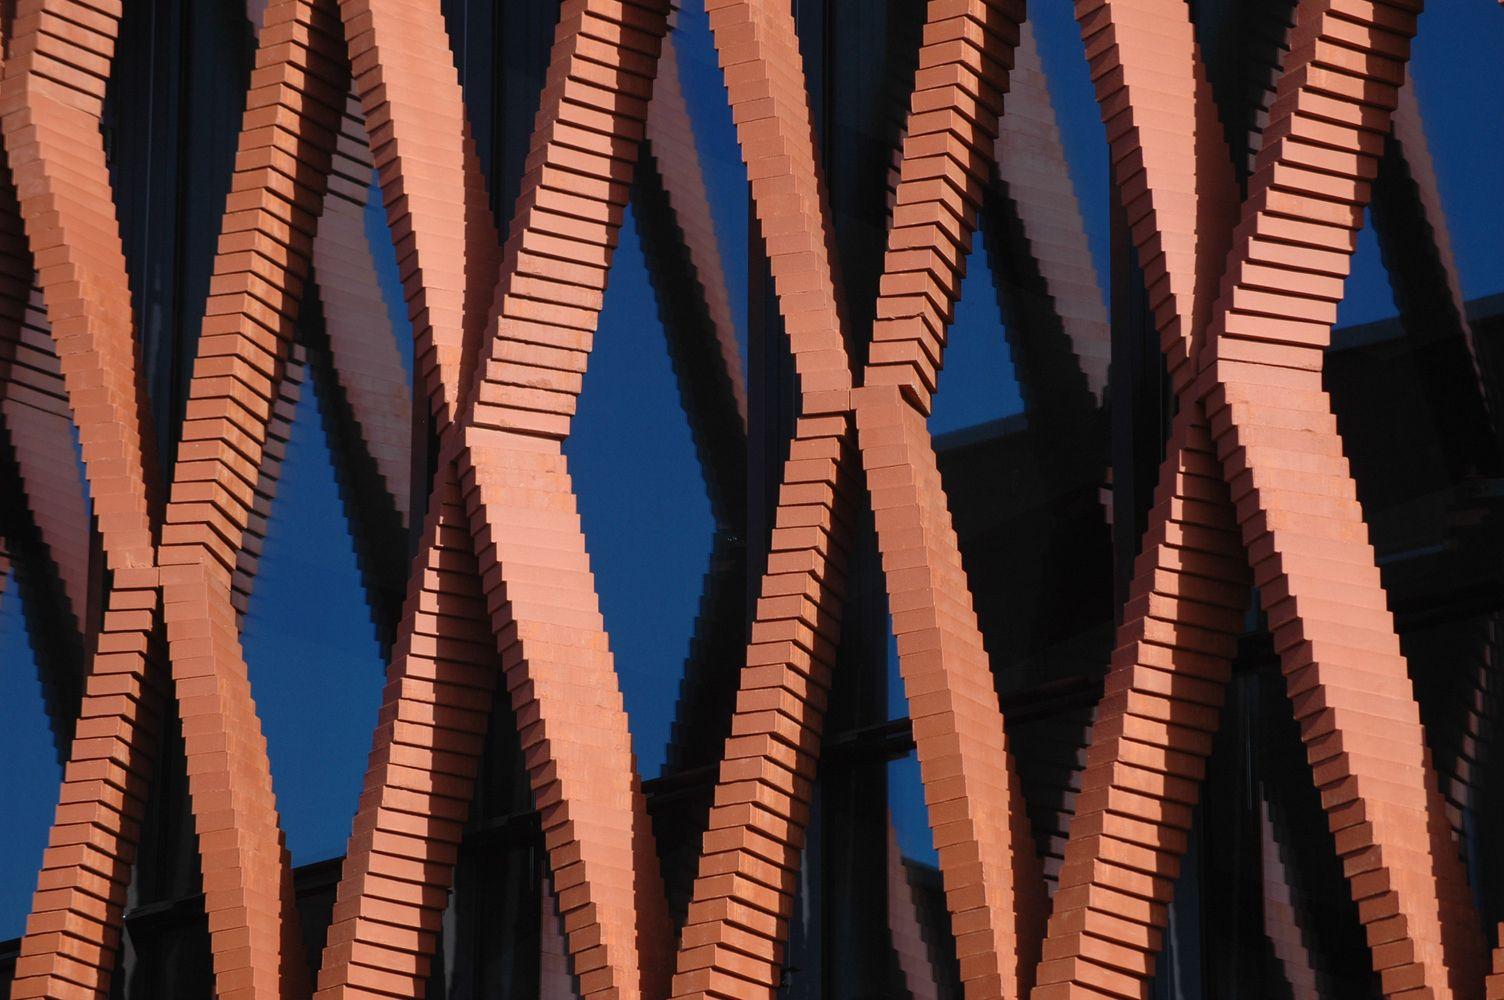 Gallery - Gramazio Kohler's Robotic Arm Creates an Elegant Twisting Brick Facade - 2